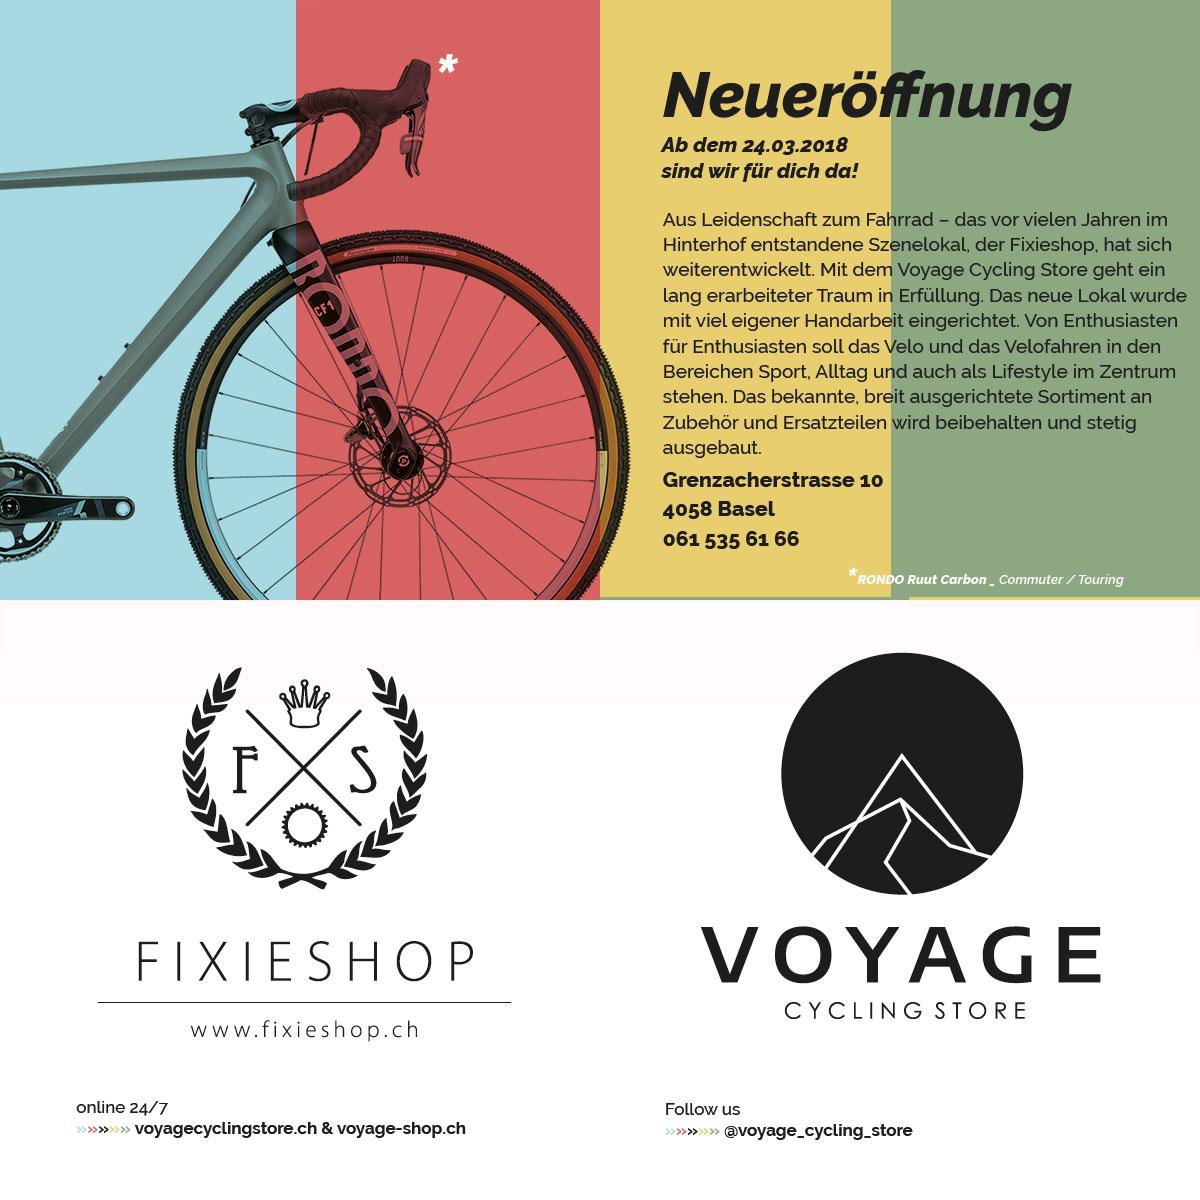 suryaputhra.com - Fixed Gear, Singlespeed und Custom Bikes mit